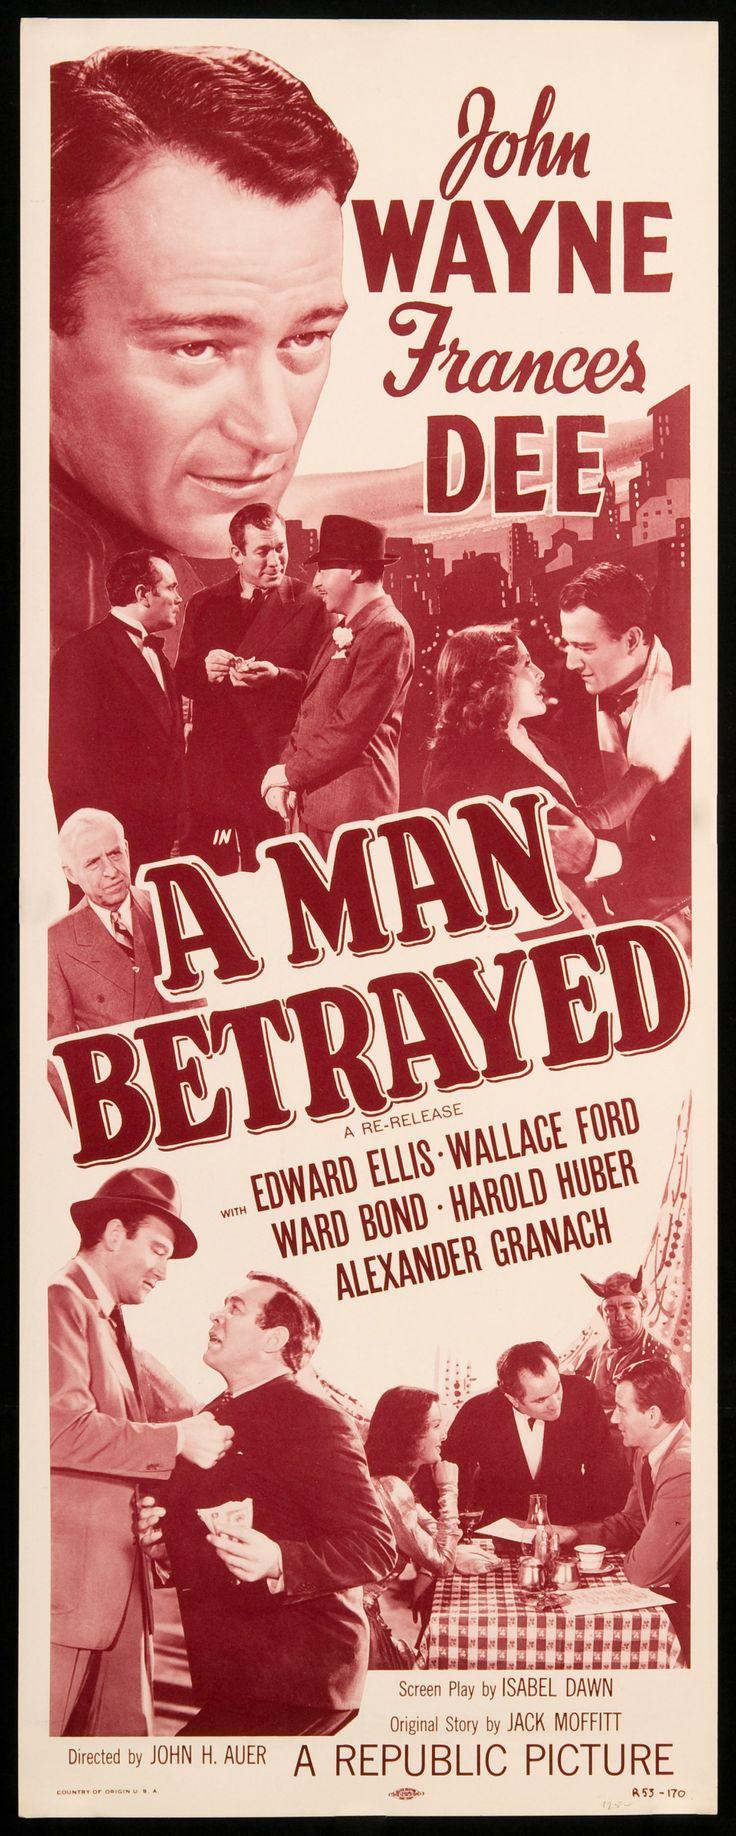 John Wayne Quotes Posters